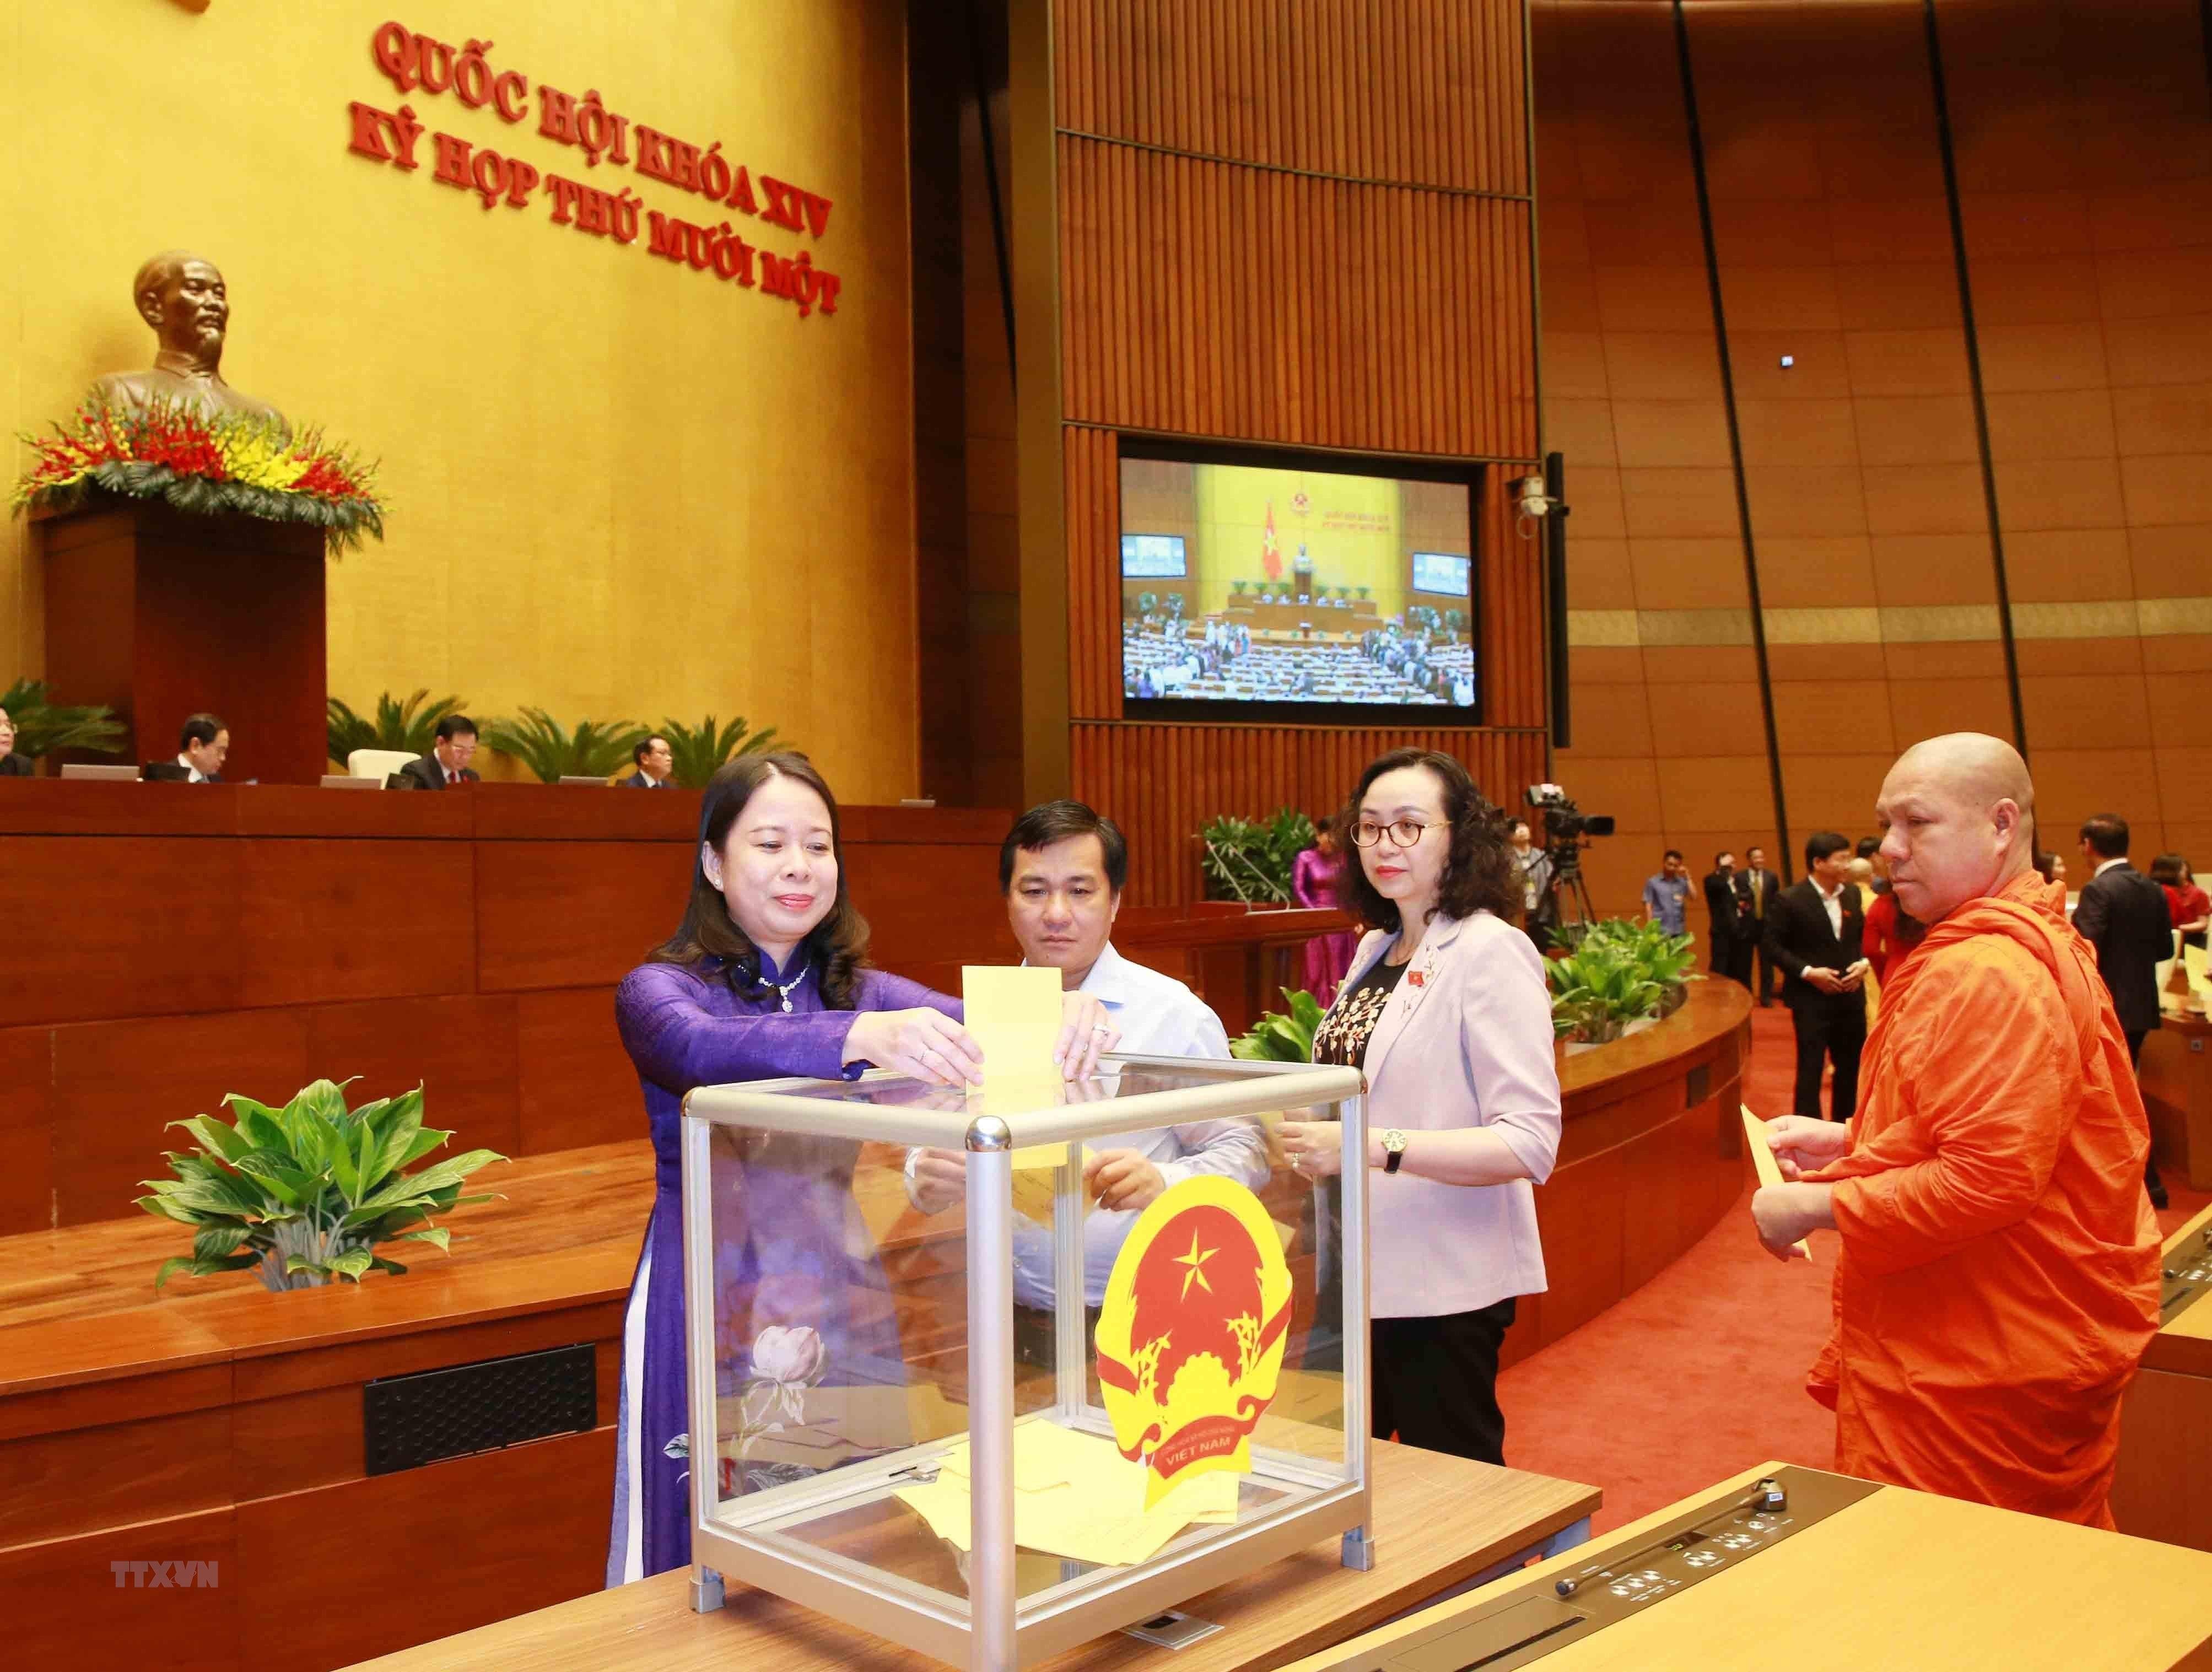 [Photo] Quoc hoi tien hanh quy trinh bo phieu bau Chu tich nuoc hinh anh 10